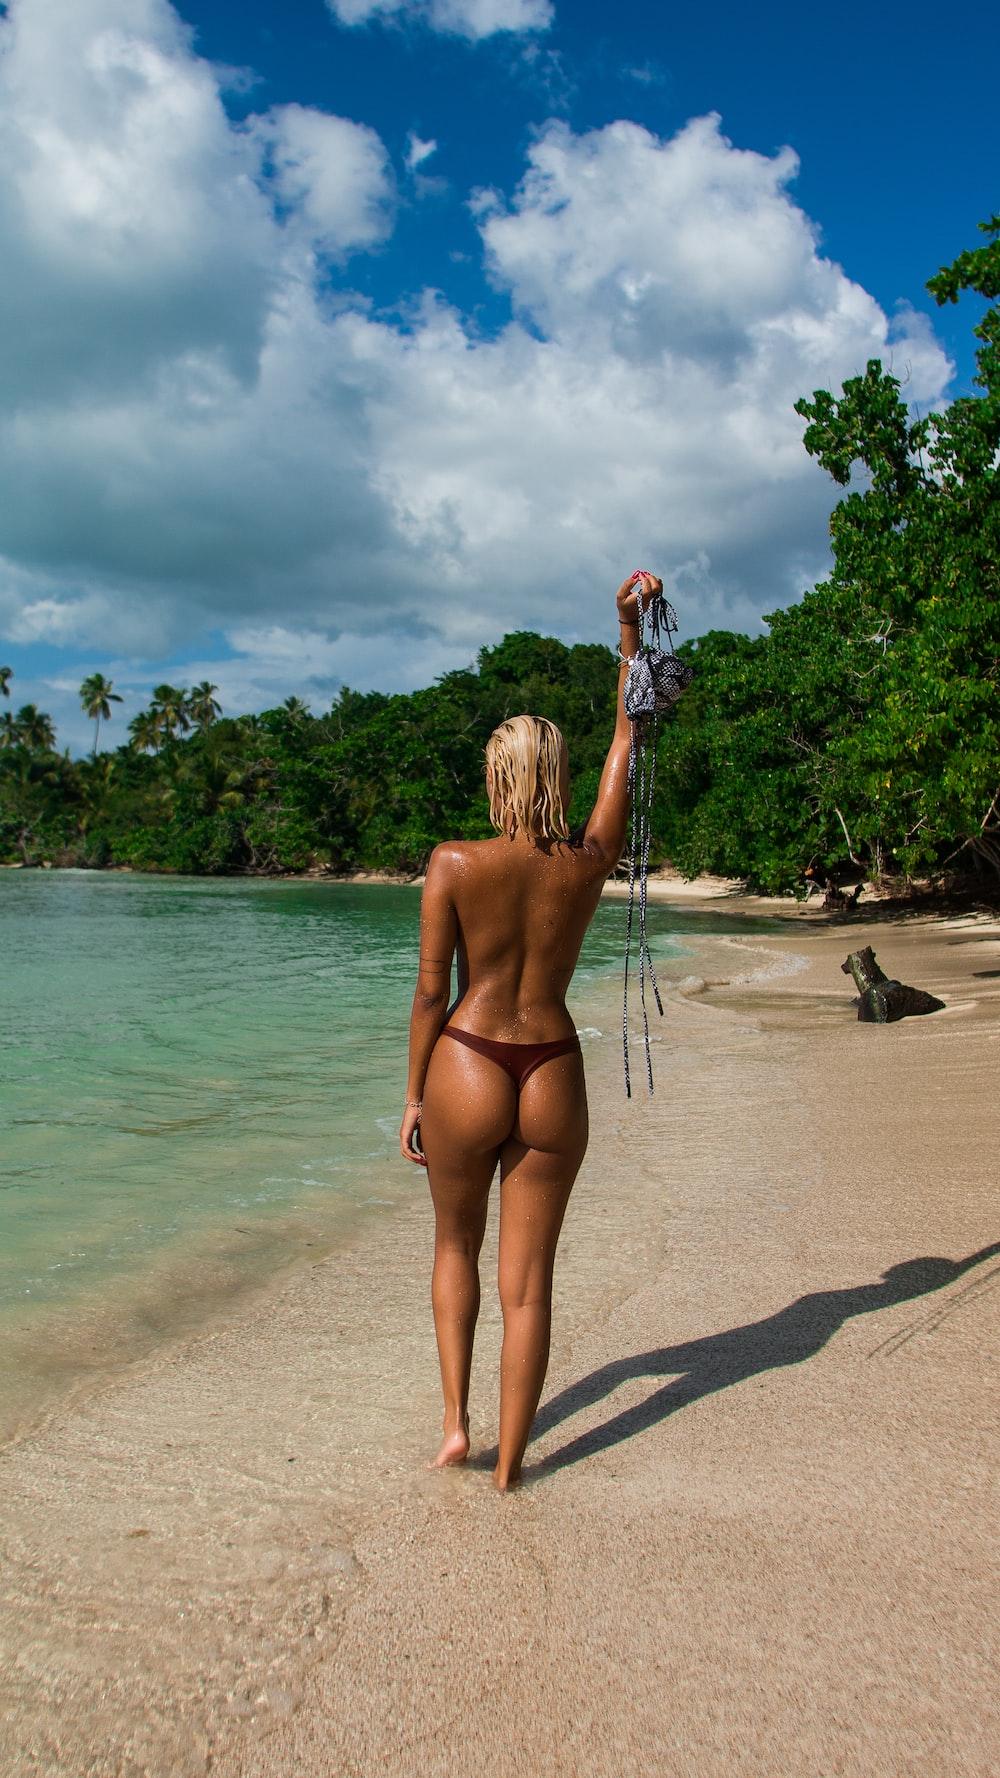 woman standing on shoreline raising her bikini top